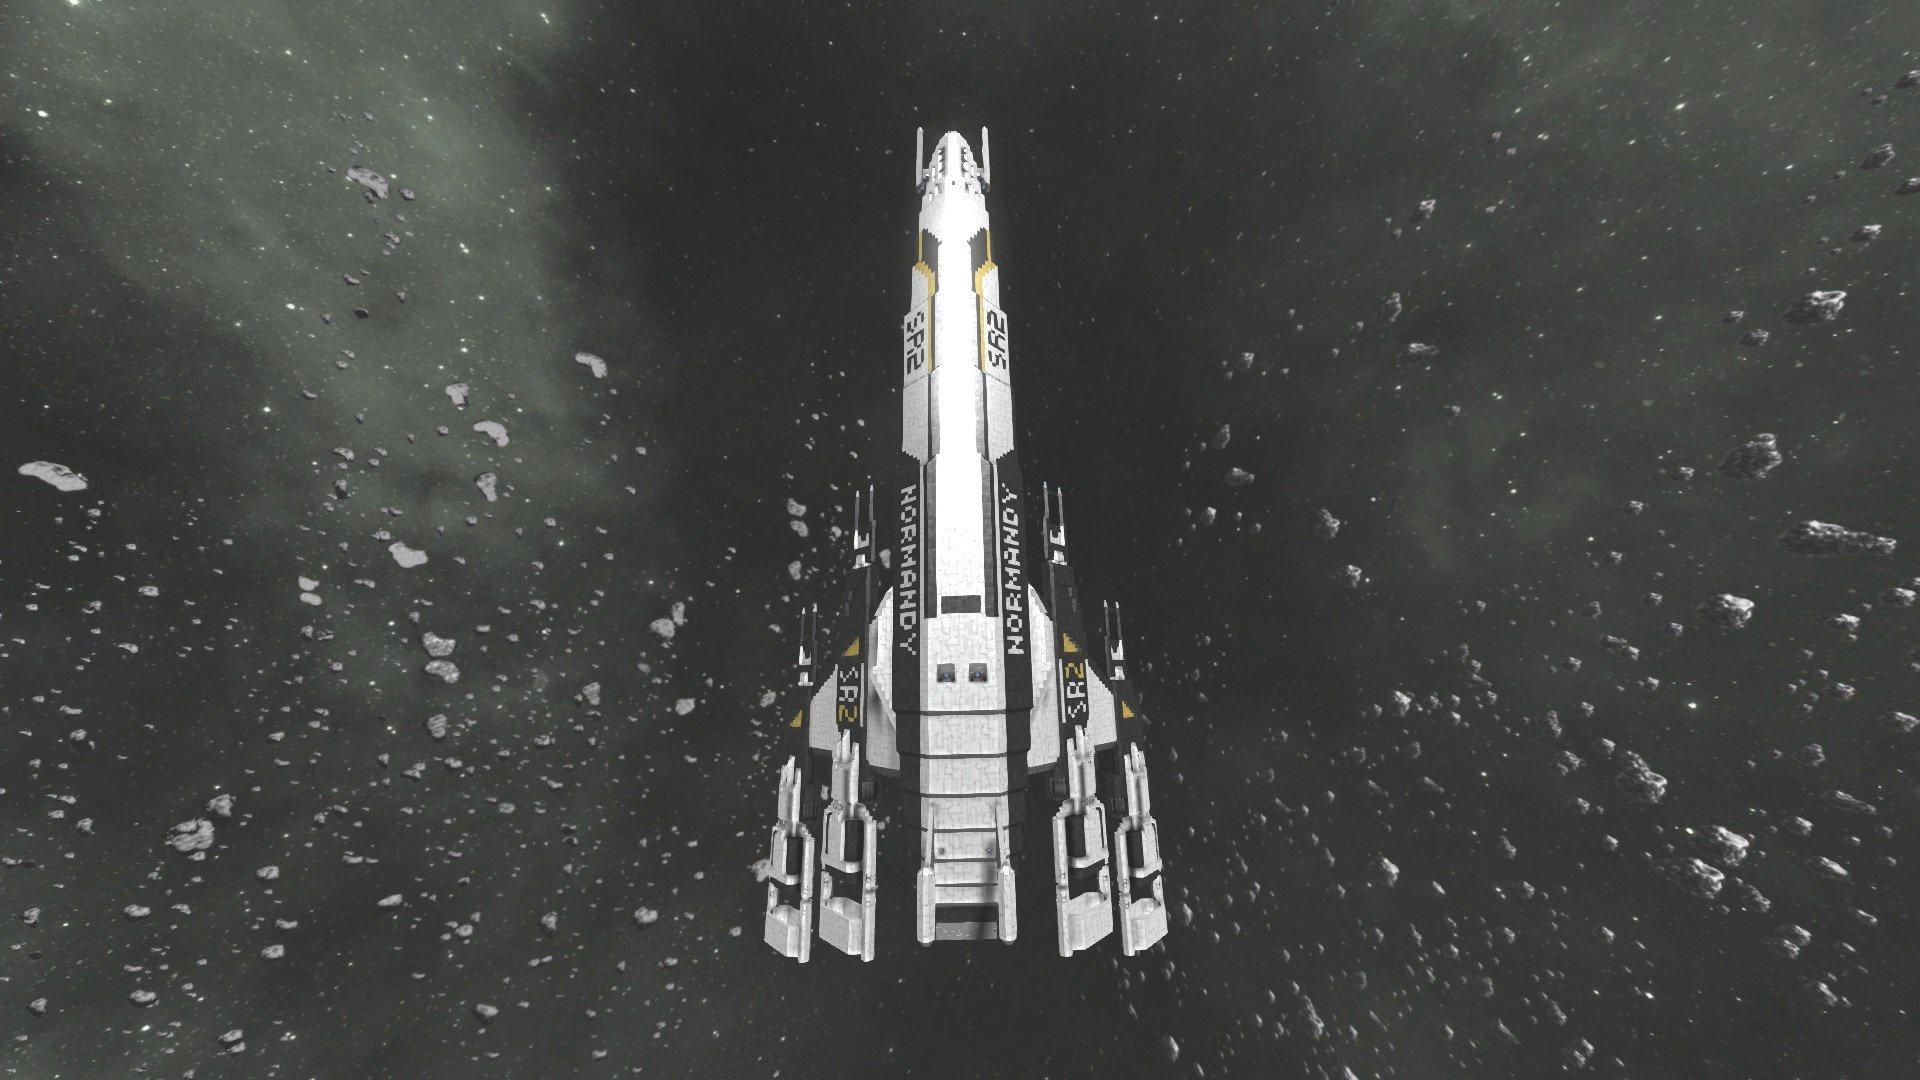 science fiction space sandbox - HD1778×1000